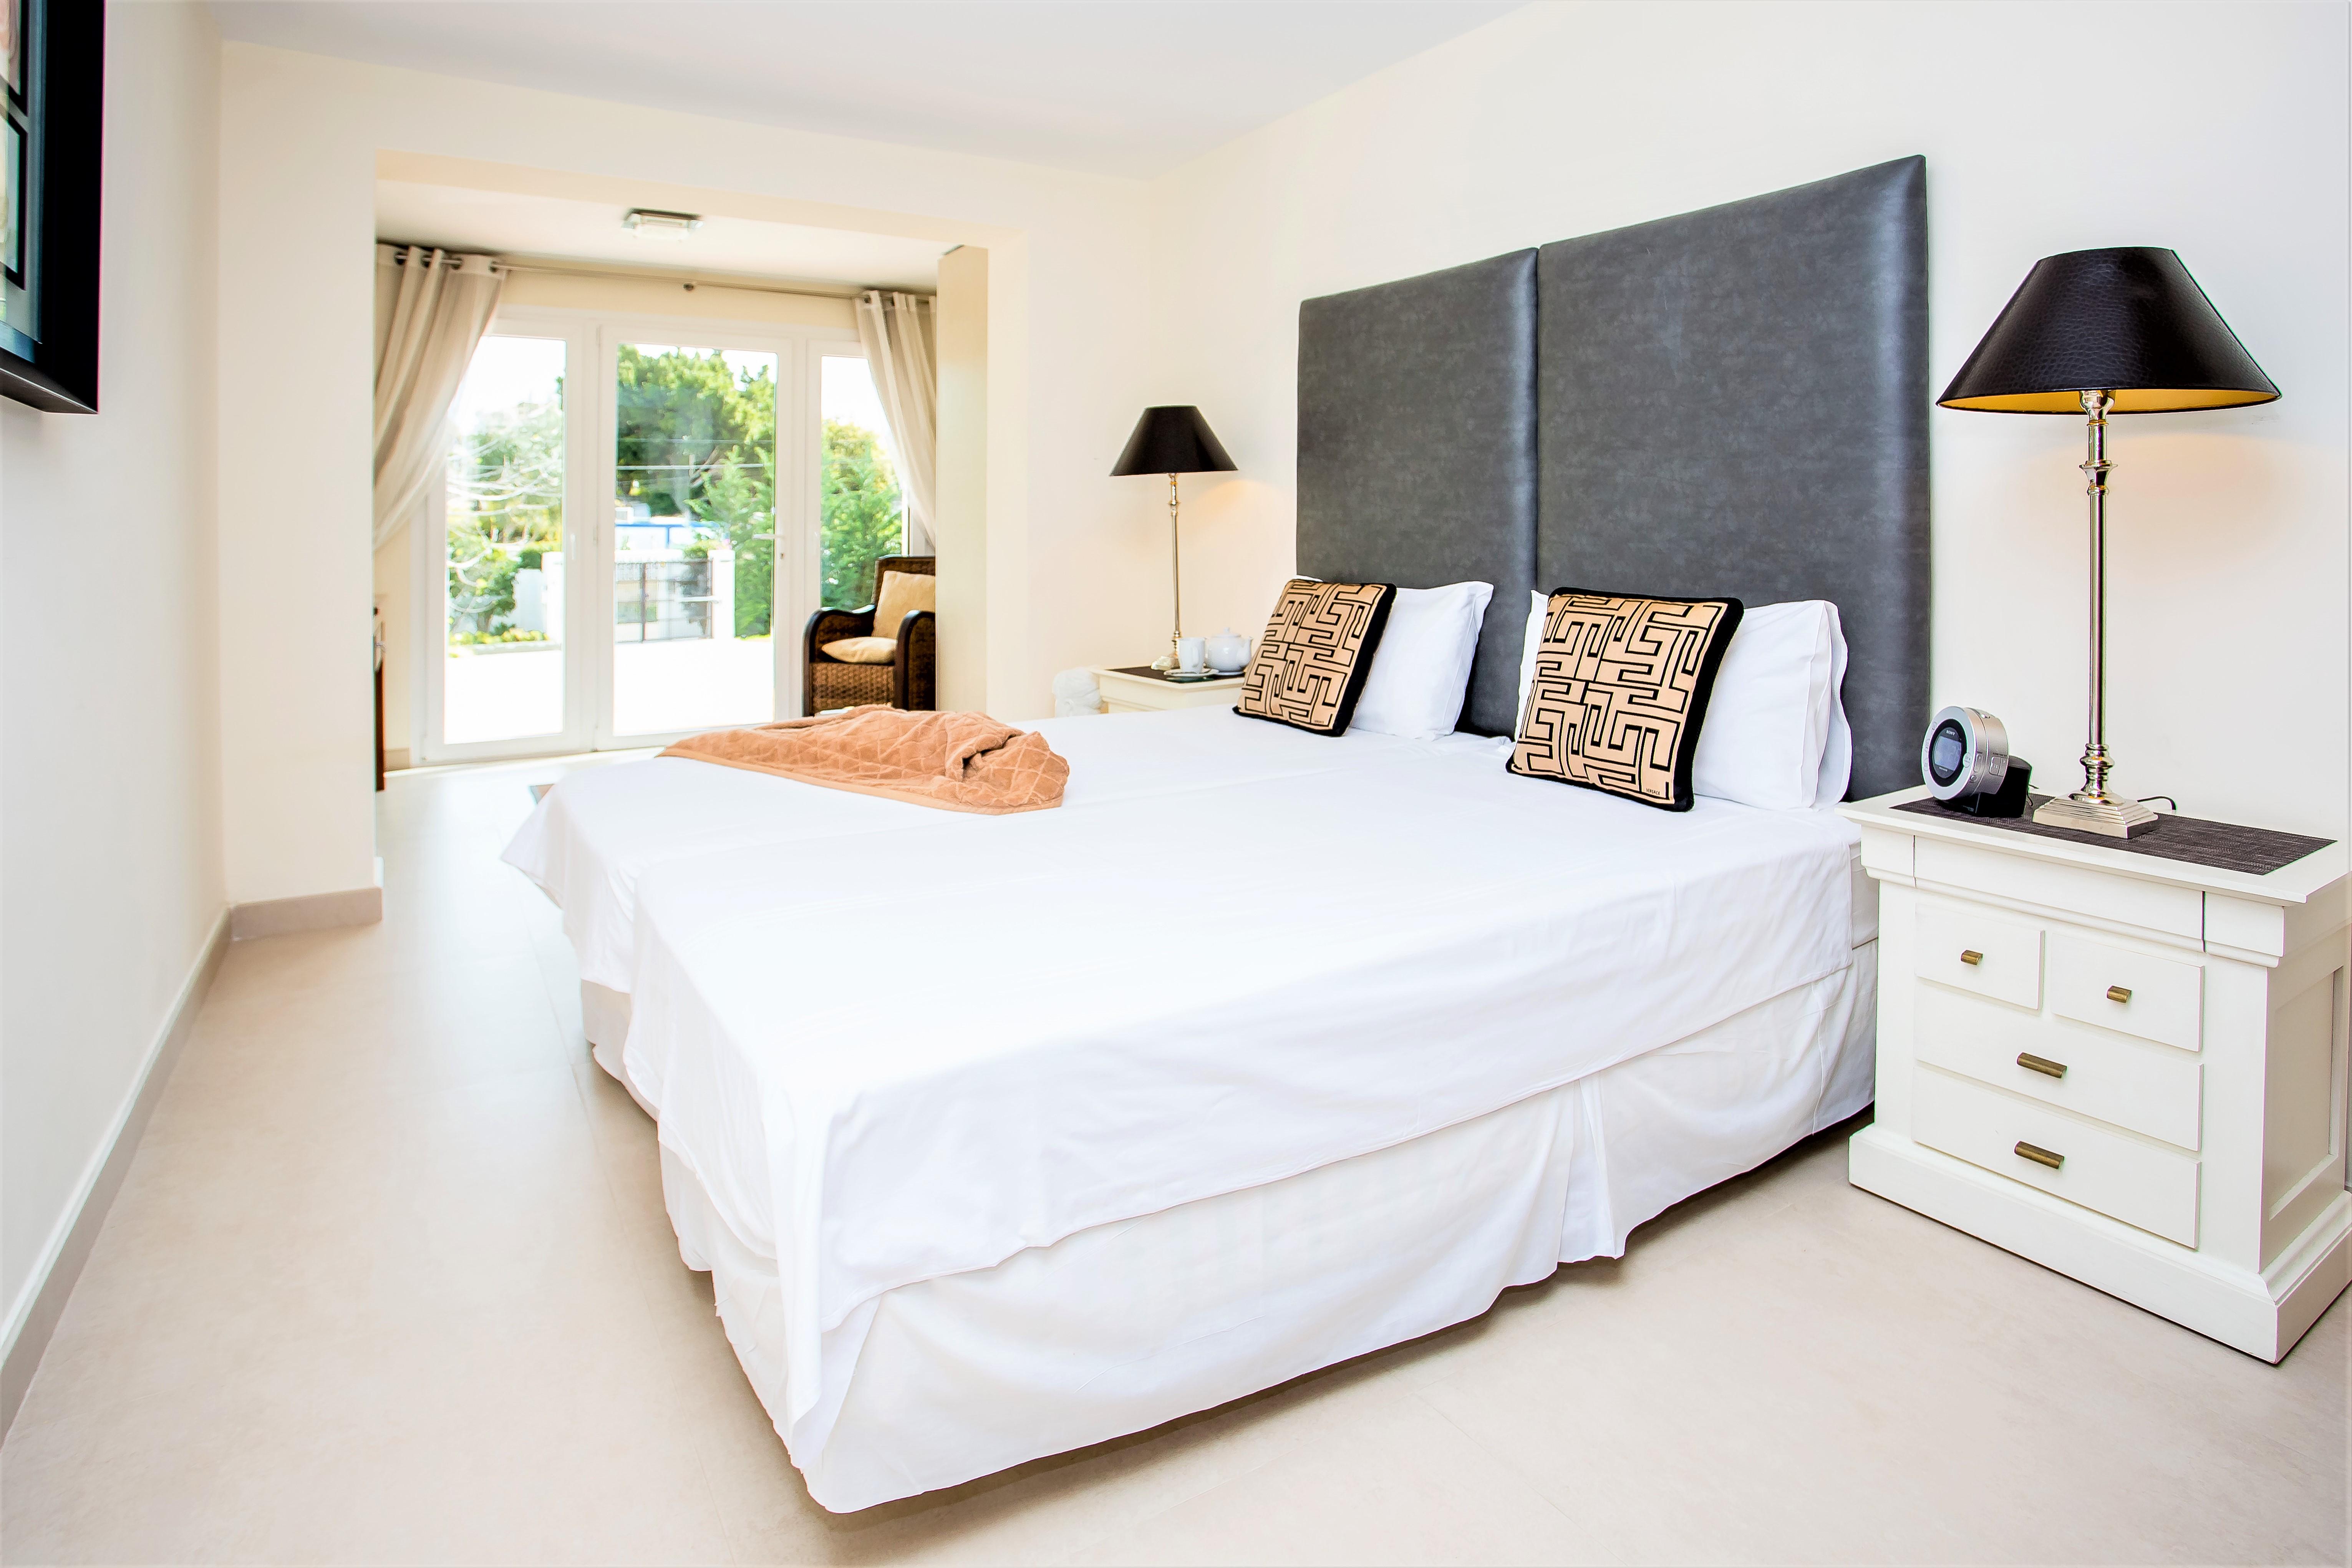 Apartment 8 Bedroom VILLA BY PUERTO BANUS   SEA 5 min                                photo 20005614